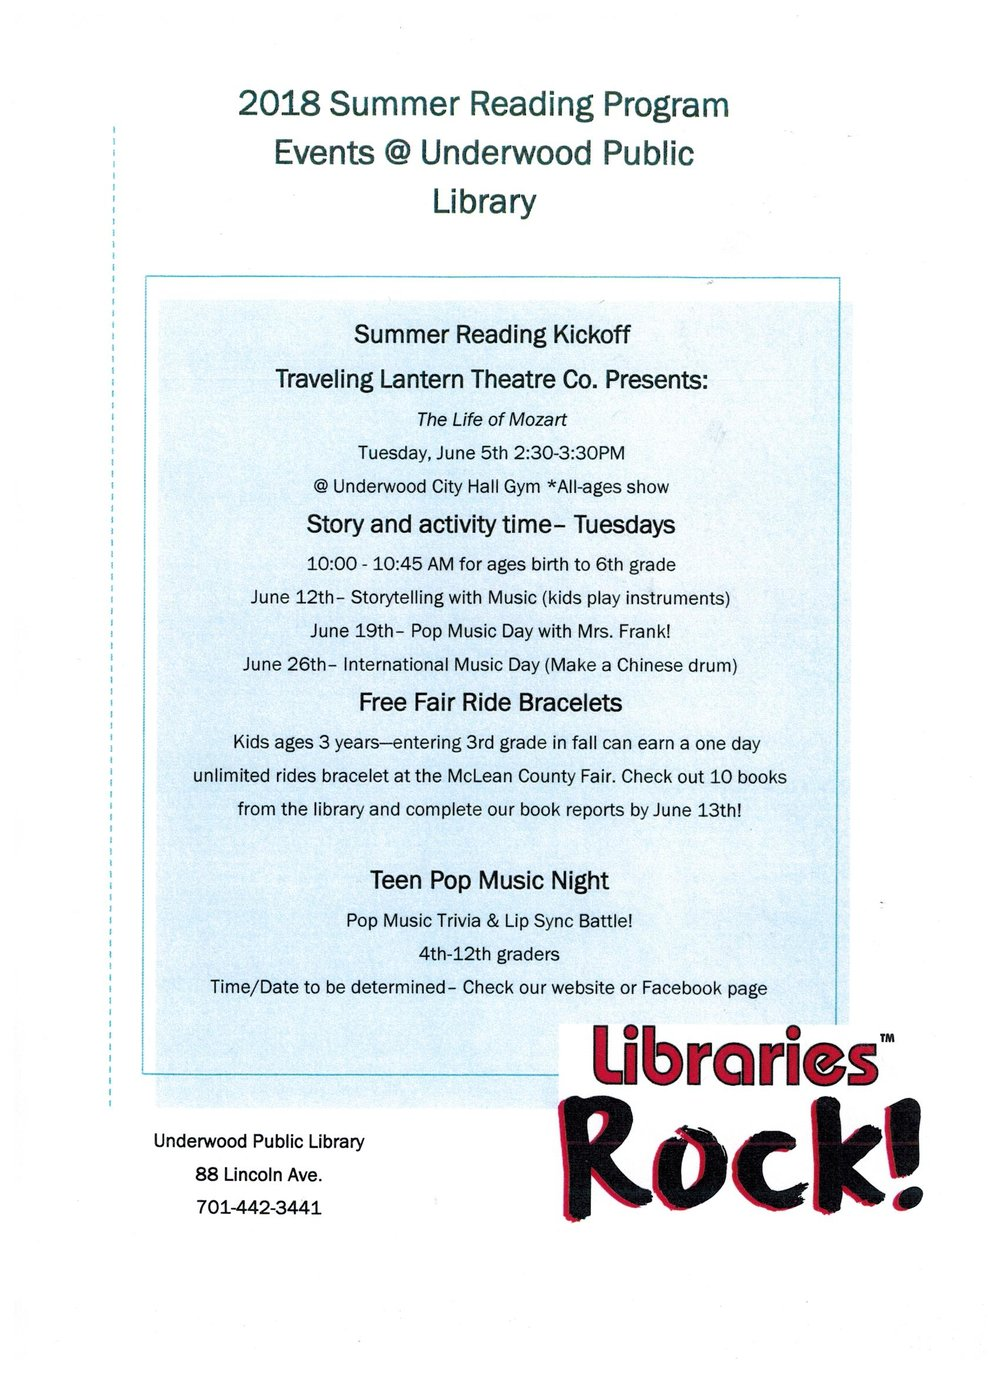 Rock library 2018.jpg